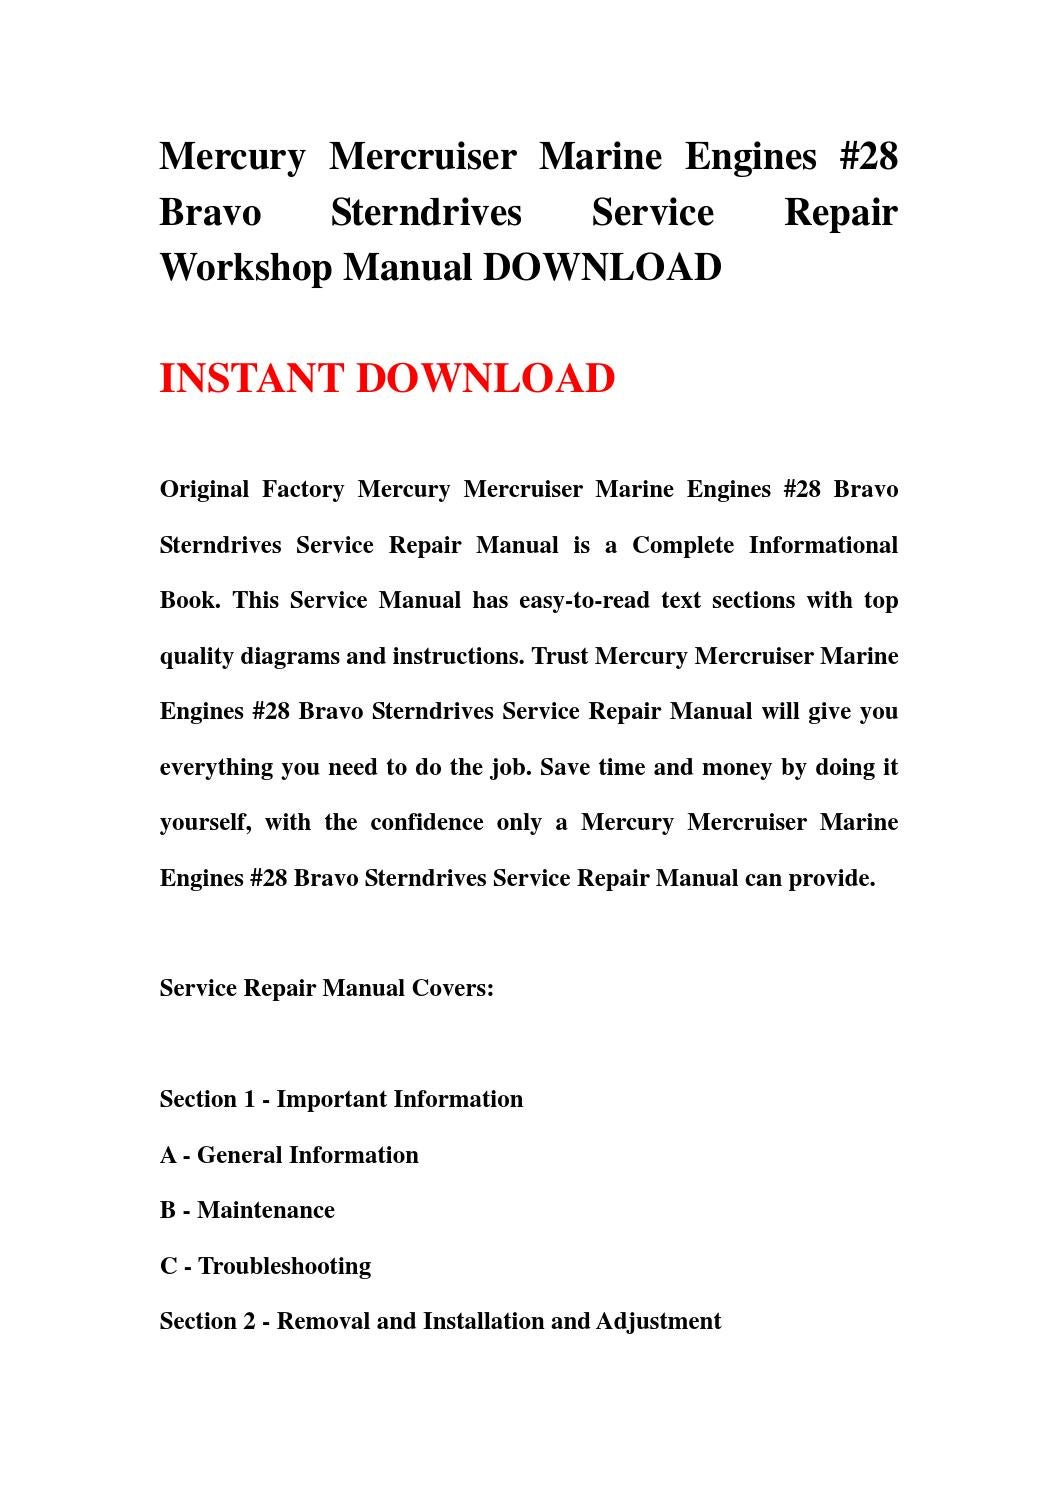 Mercury mercruiser marine engines #28 bravo sterndrives service repair  workshop manual download by hgsehfbe - issuu